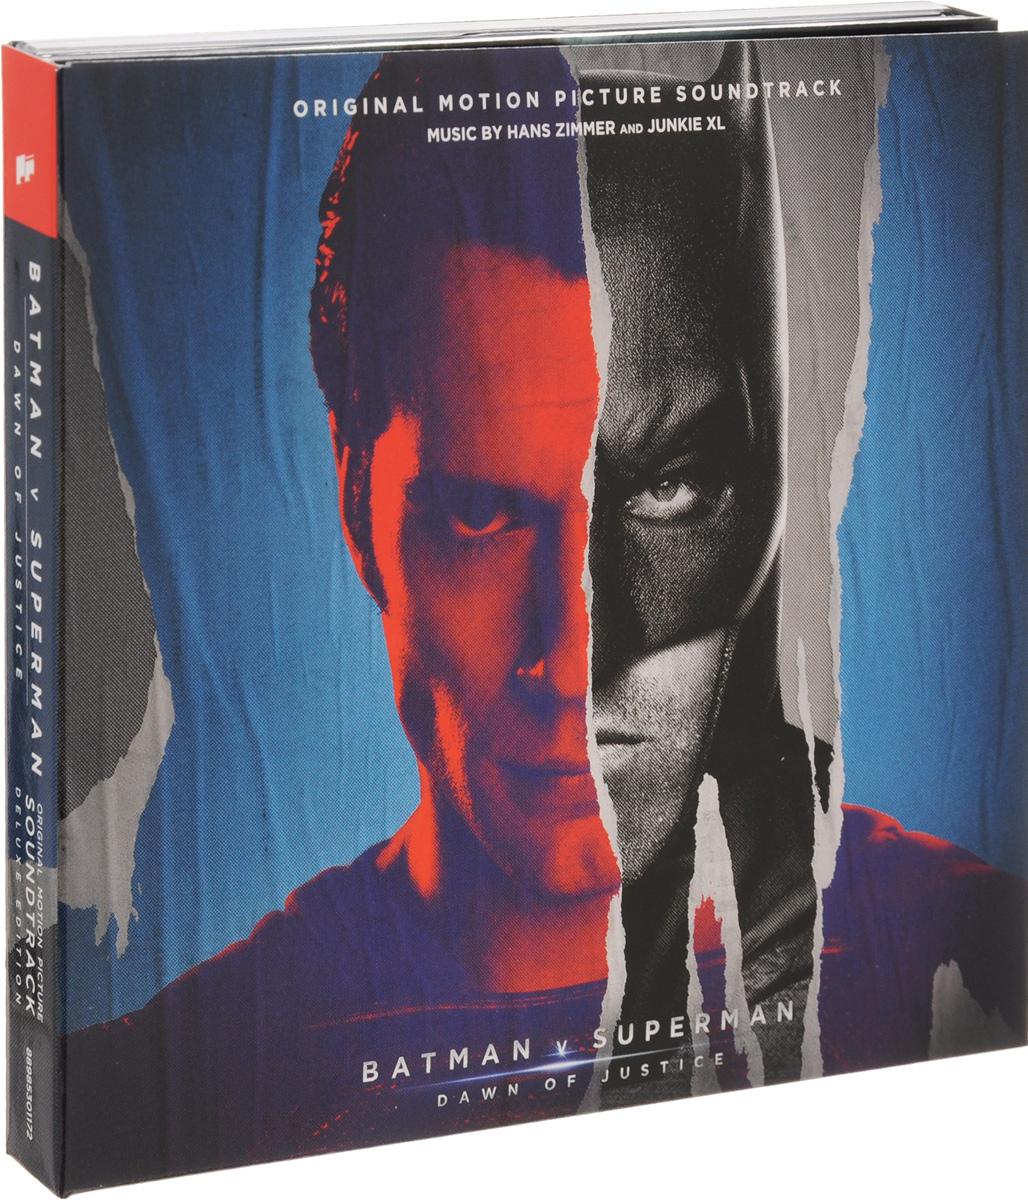 Hans Zimmer, Junkie XL. Batman V Superman. Dawn Of Justice. Original Motion Picture Soundtrack. Deluxe Edition (2 CD) interstellar original motion picture soundtrack music by hans zimmer